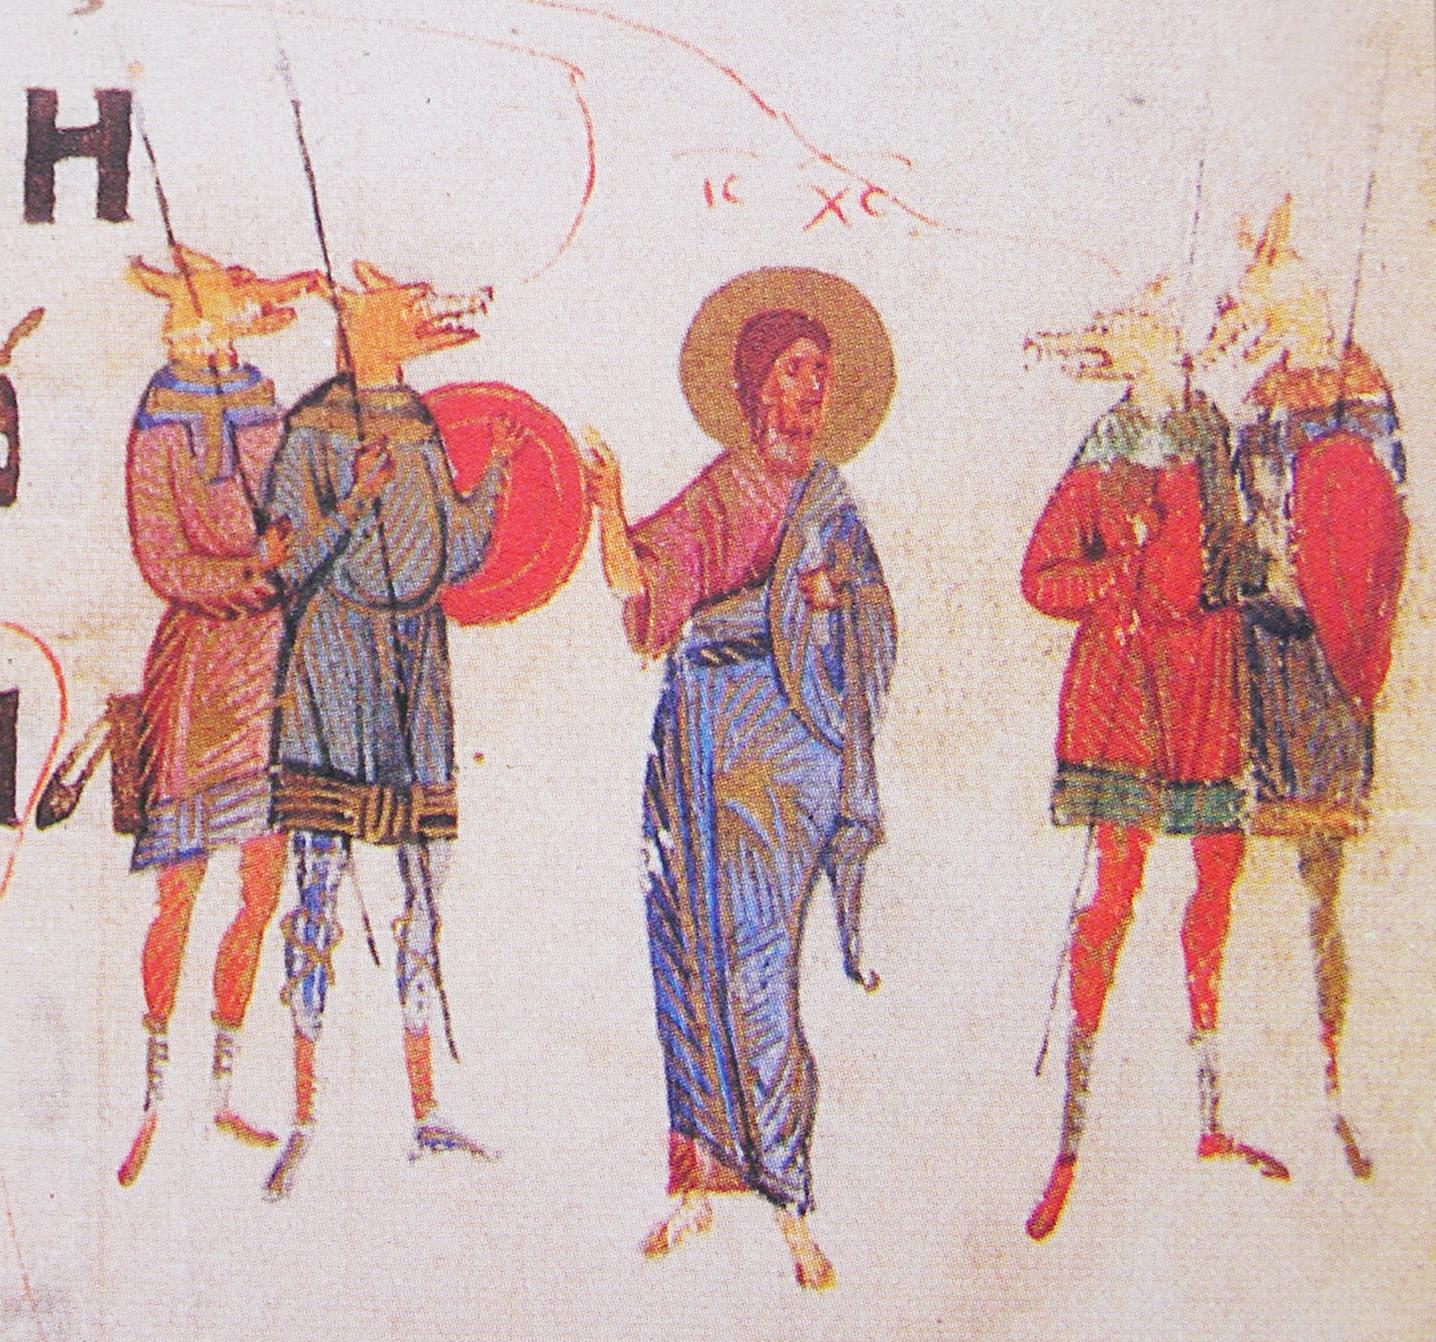 Cynocephali illustrated in the Kievan psalter, 1397